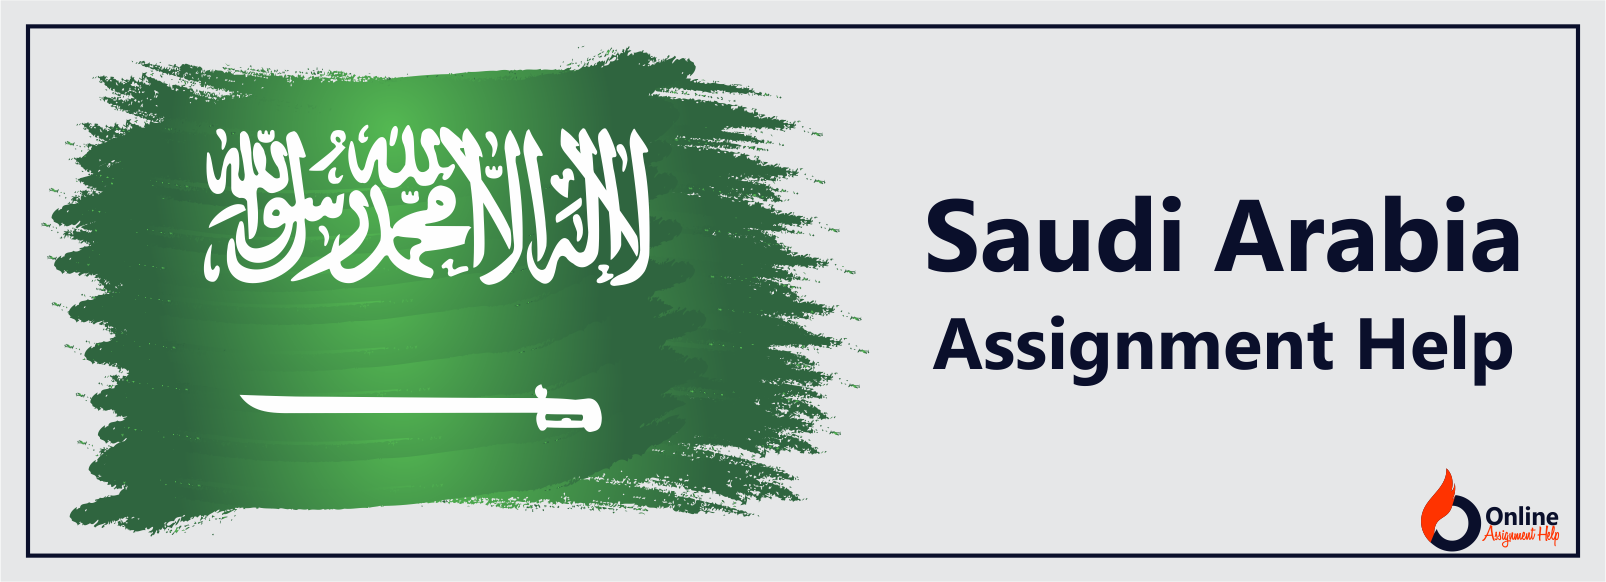 Assignment Help Saudi Arabia